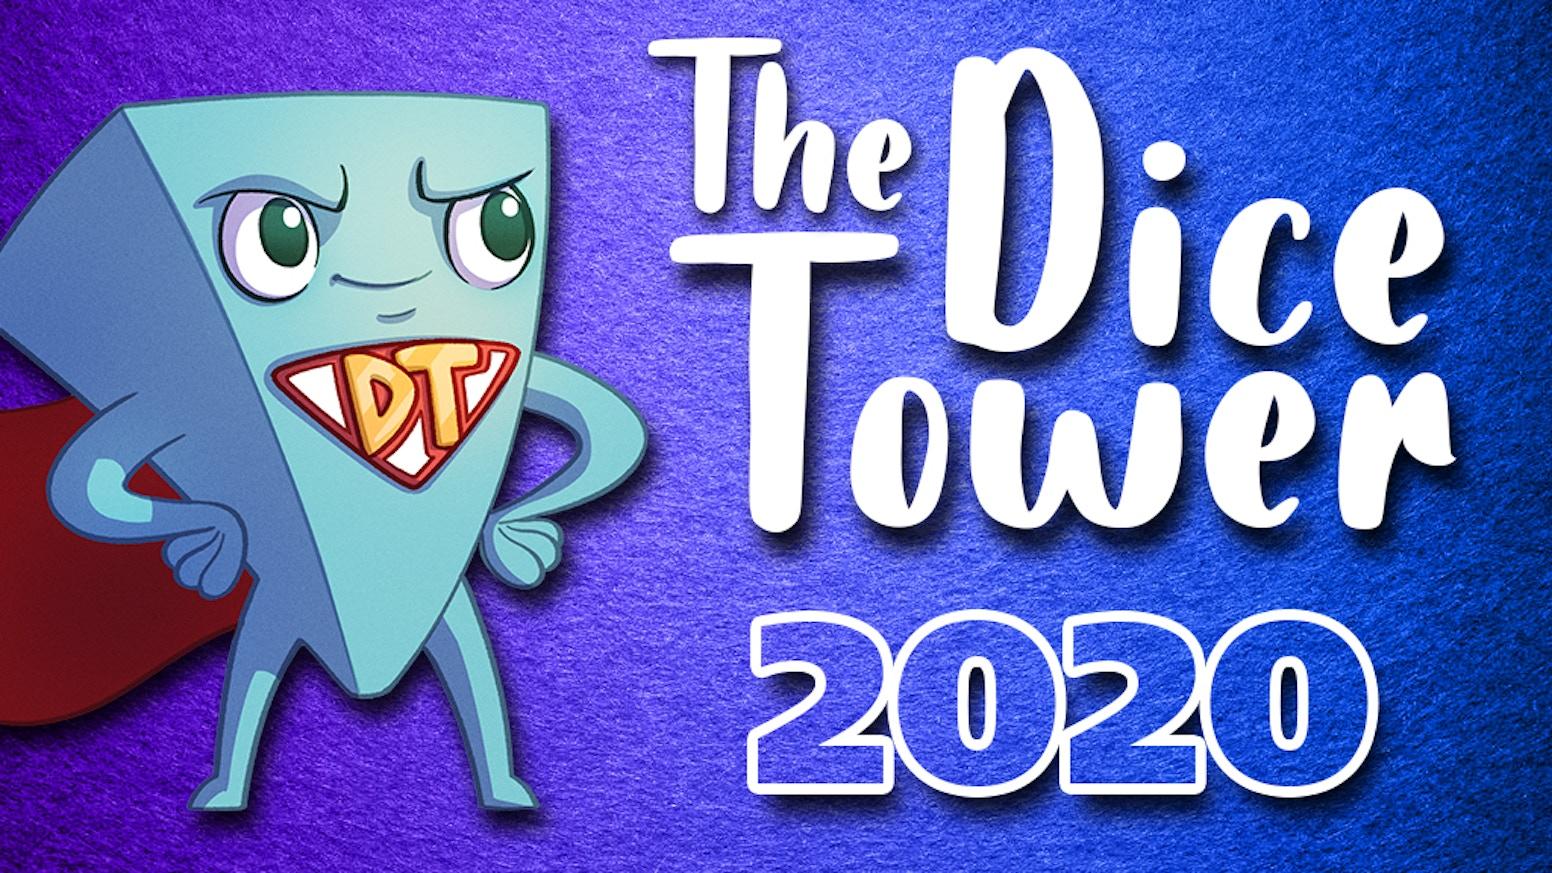 Dice Tower Christmas 2020 Dice Tower   2020 by Tom Vasel — Kickstarter